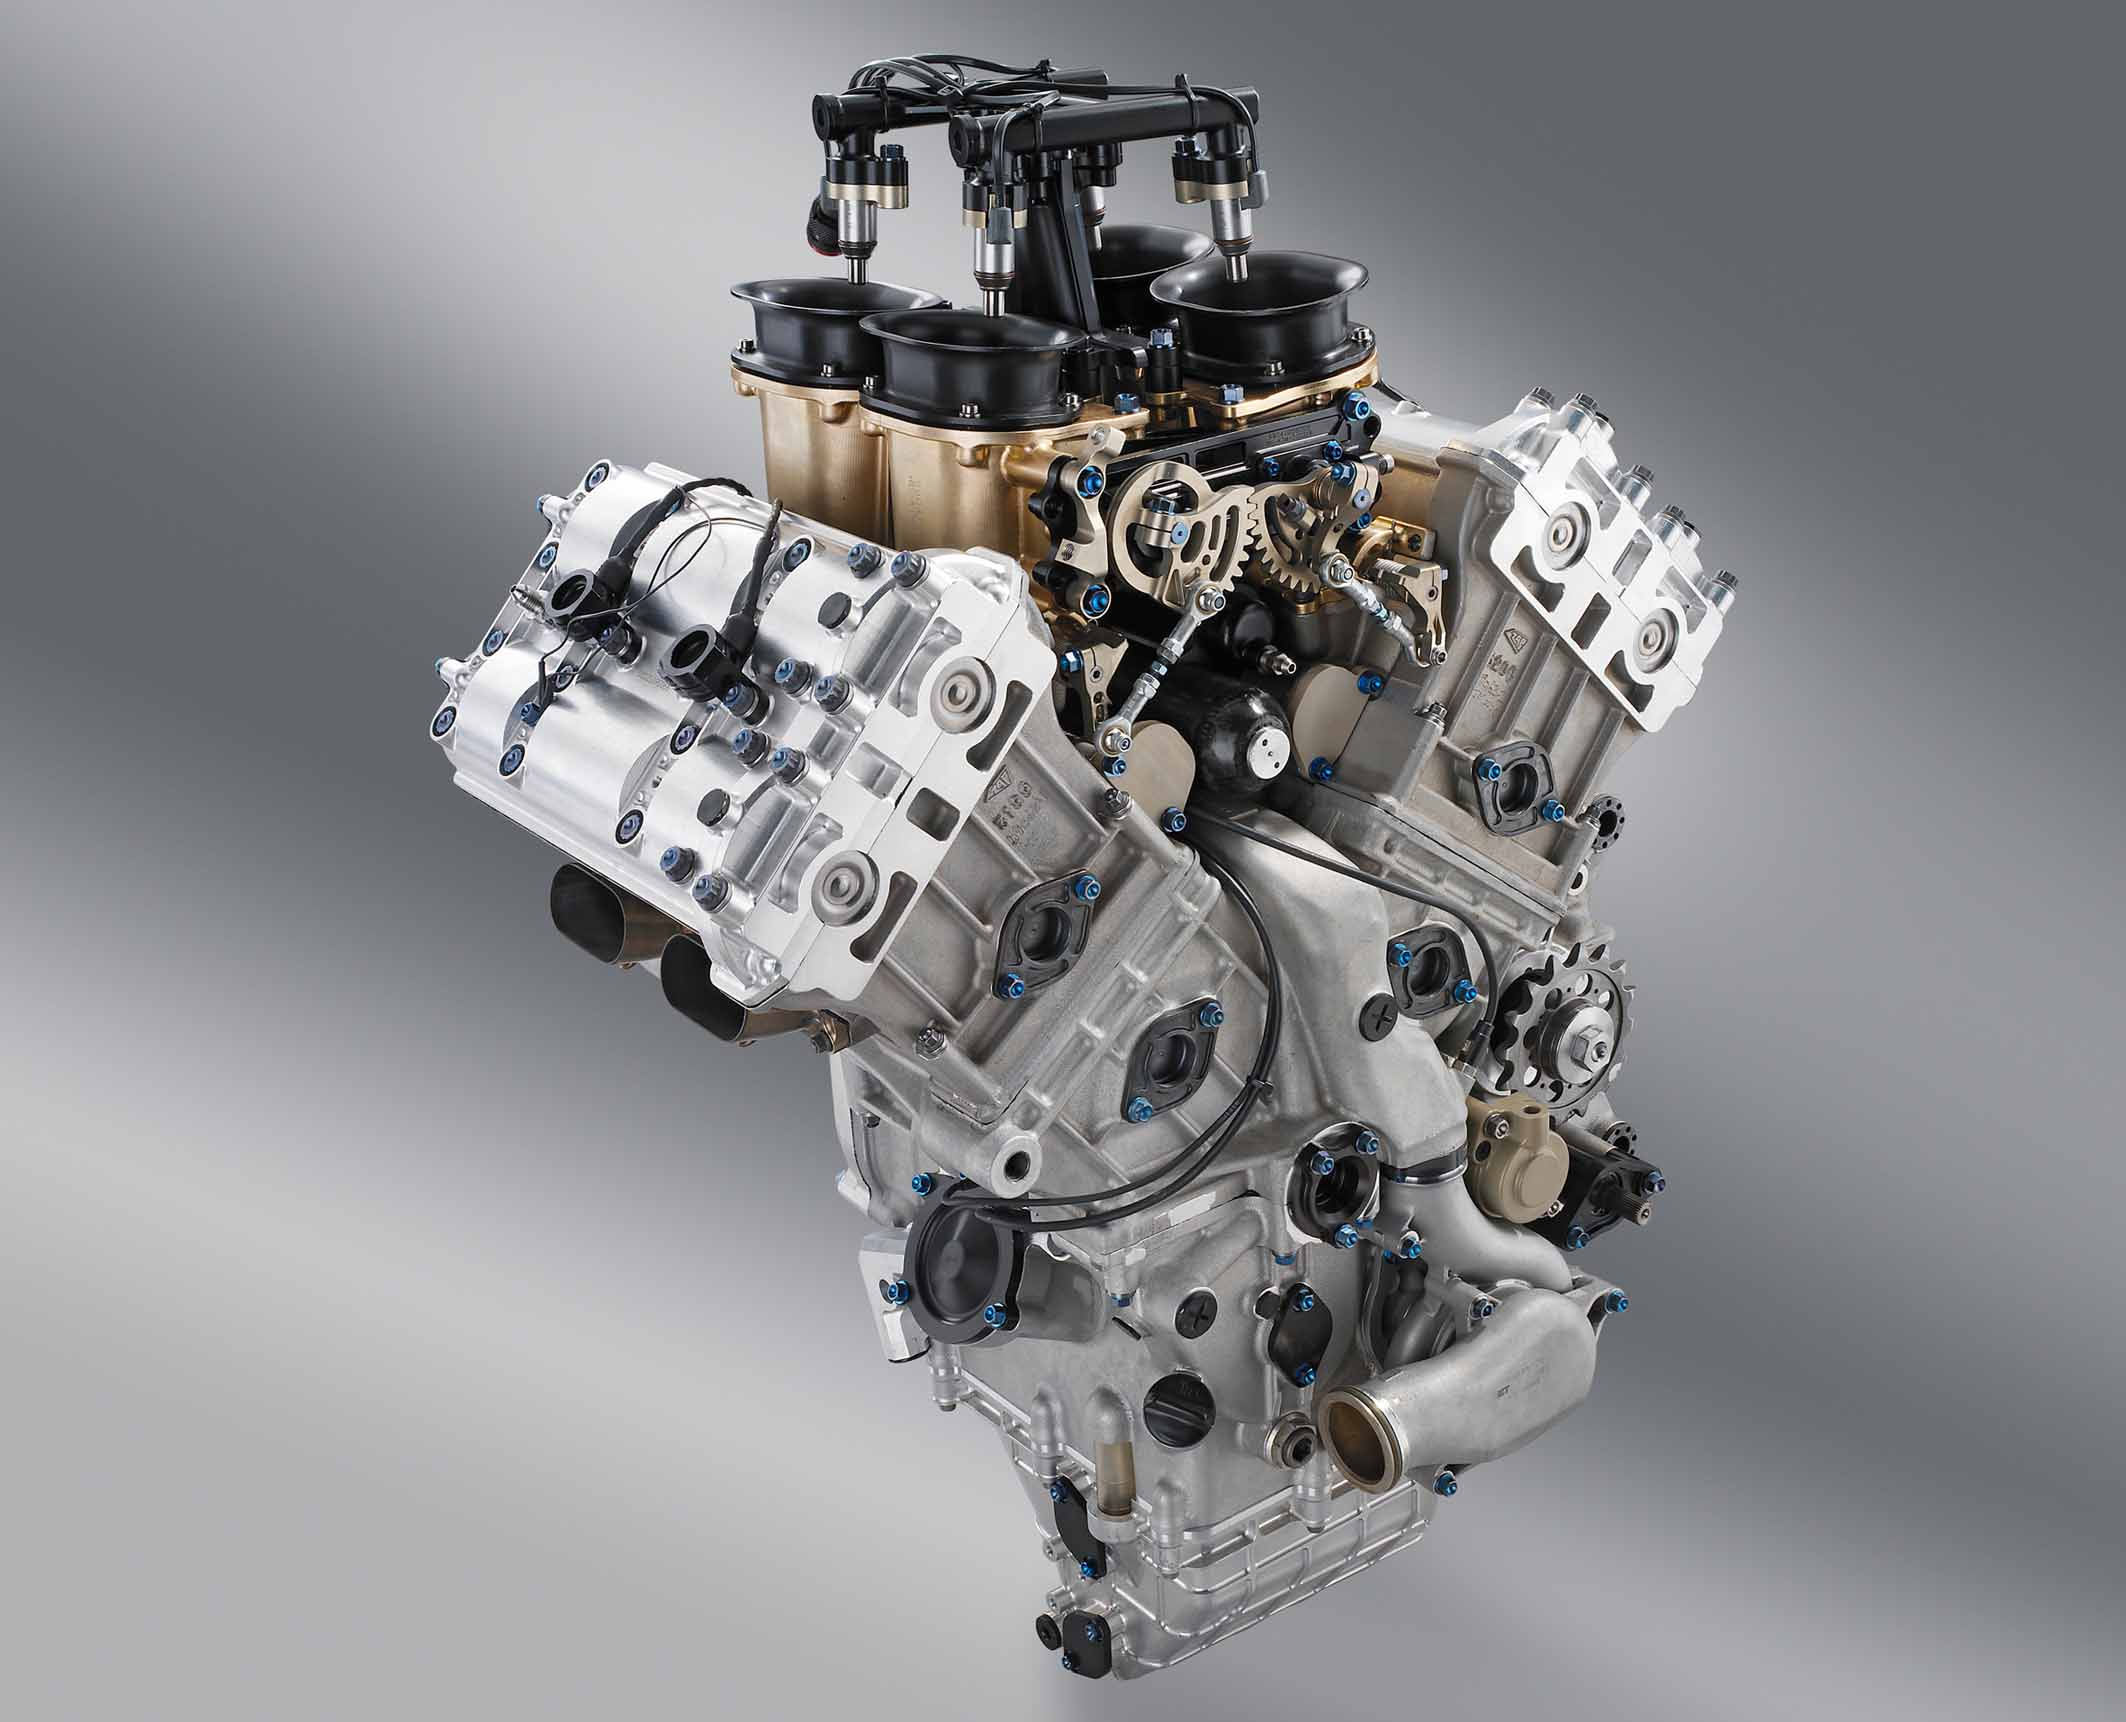 2018 ktm hard parts. Beautiful Parts 2005spec MotoGP KTM Engine  In 2018 Ktm Hard Parts